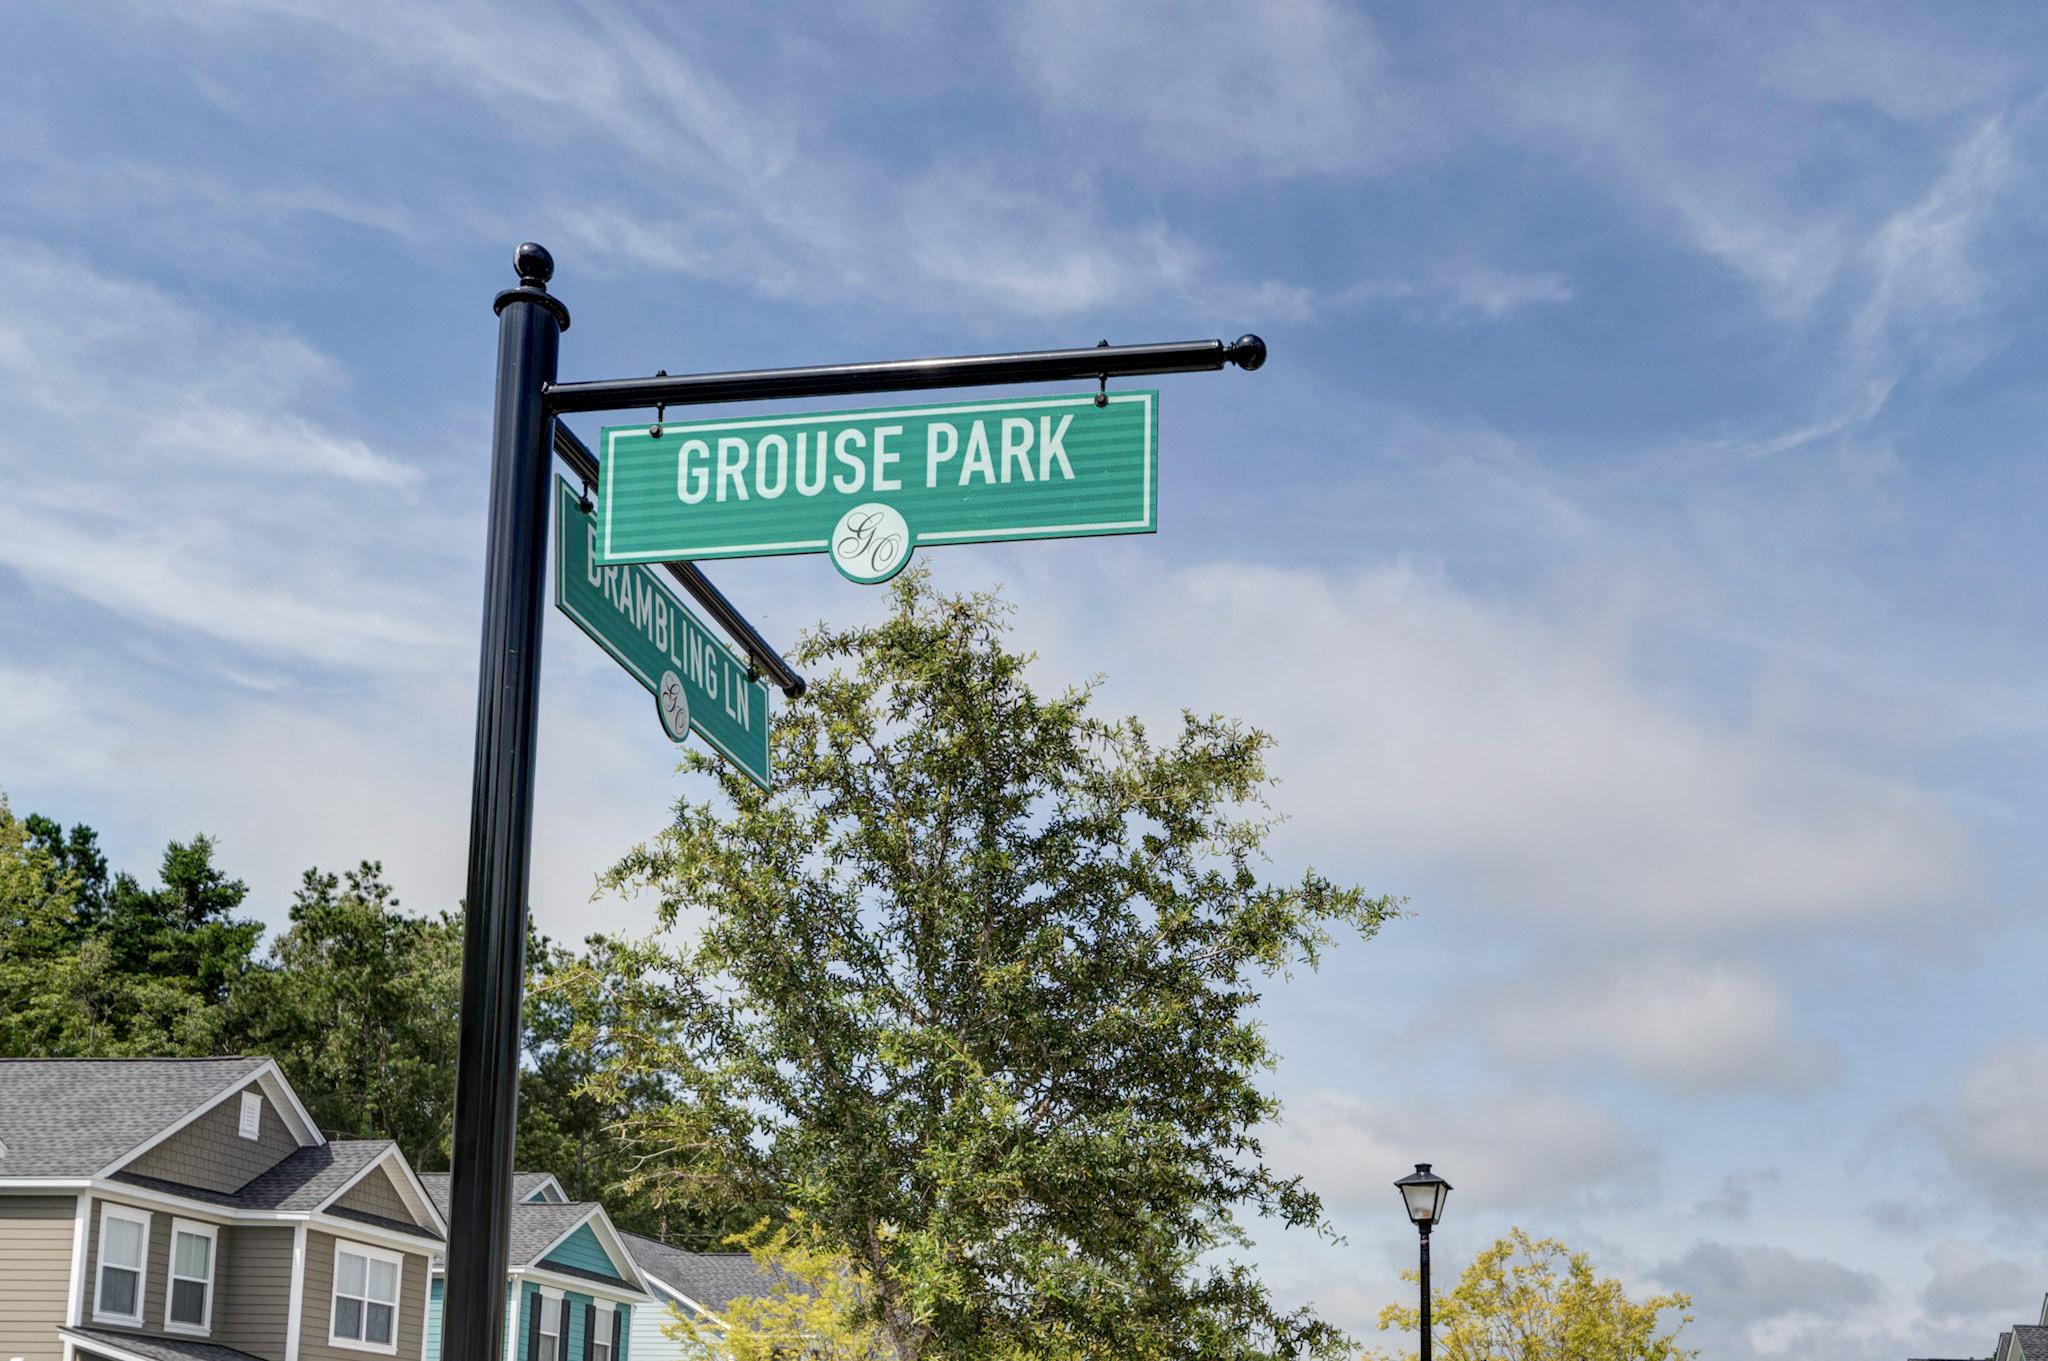 336 Grouse Park Charleston, Sc 29414